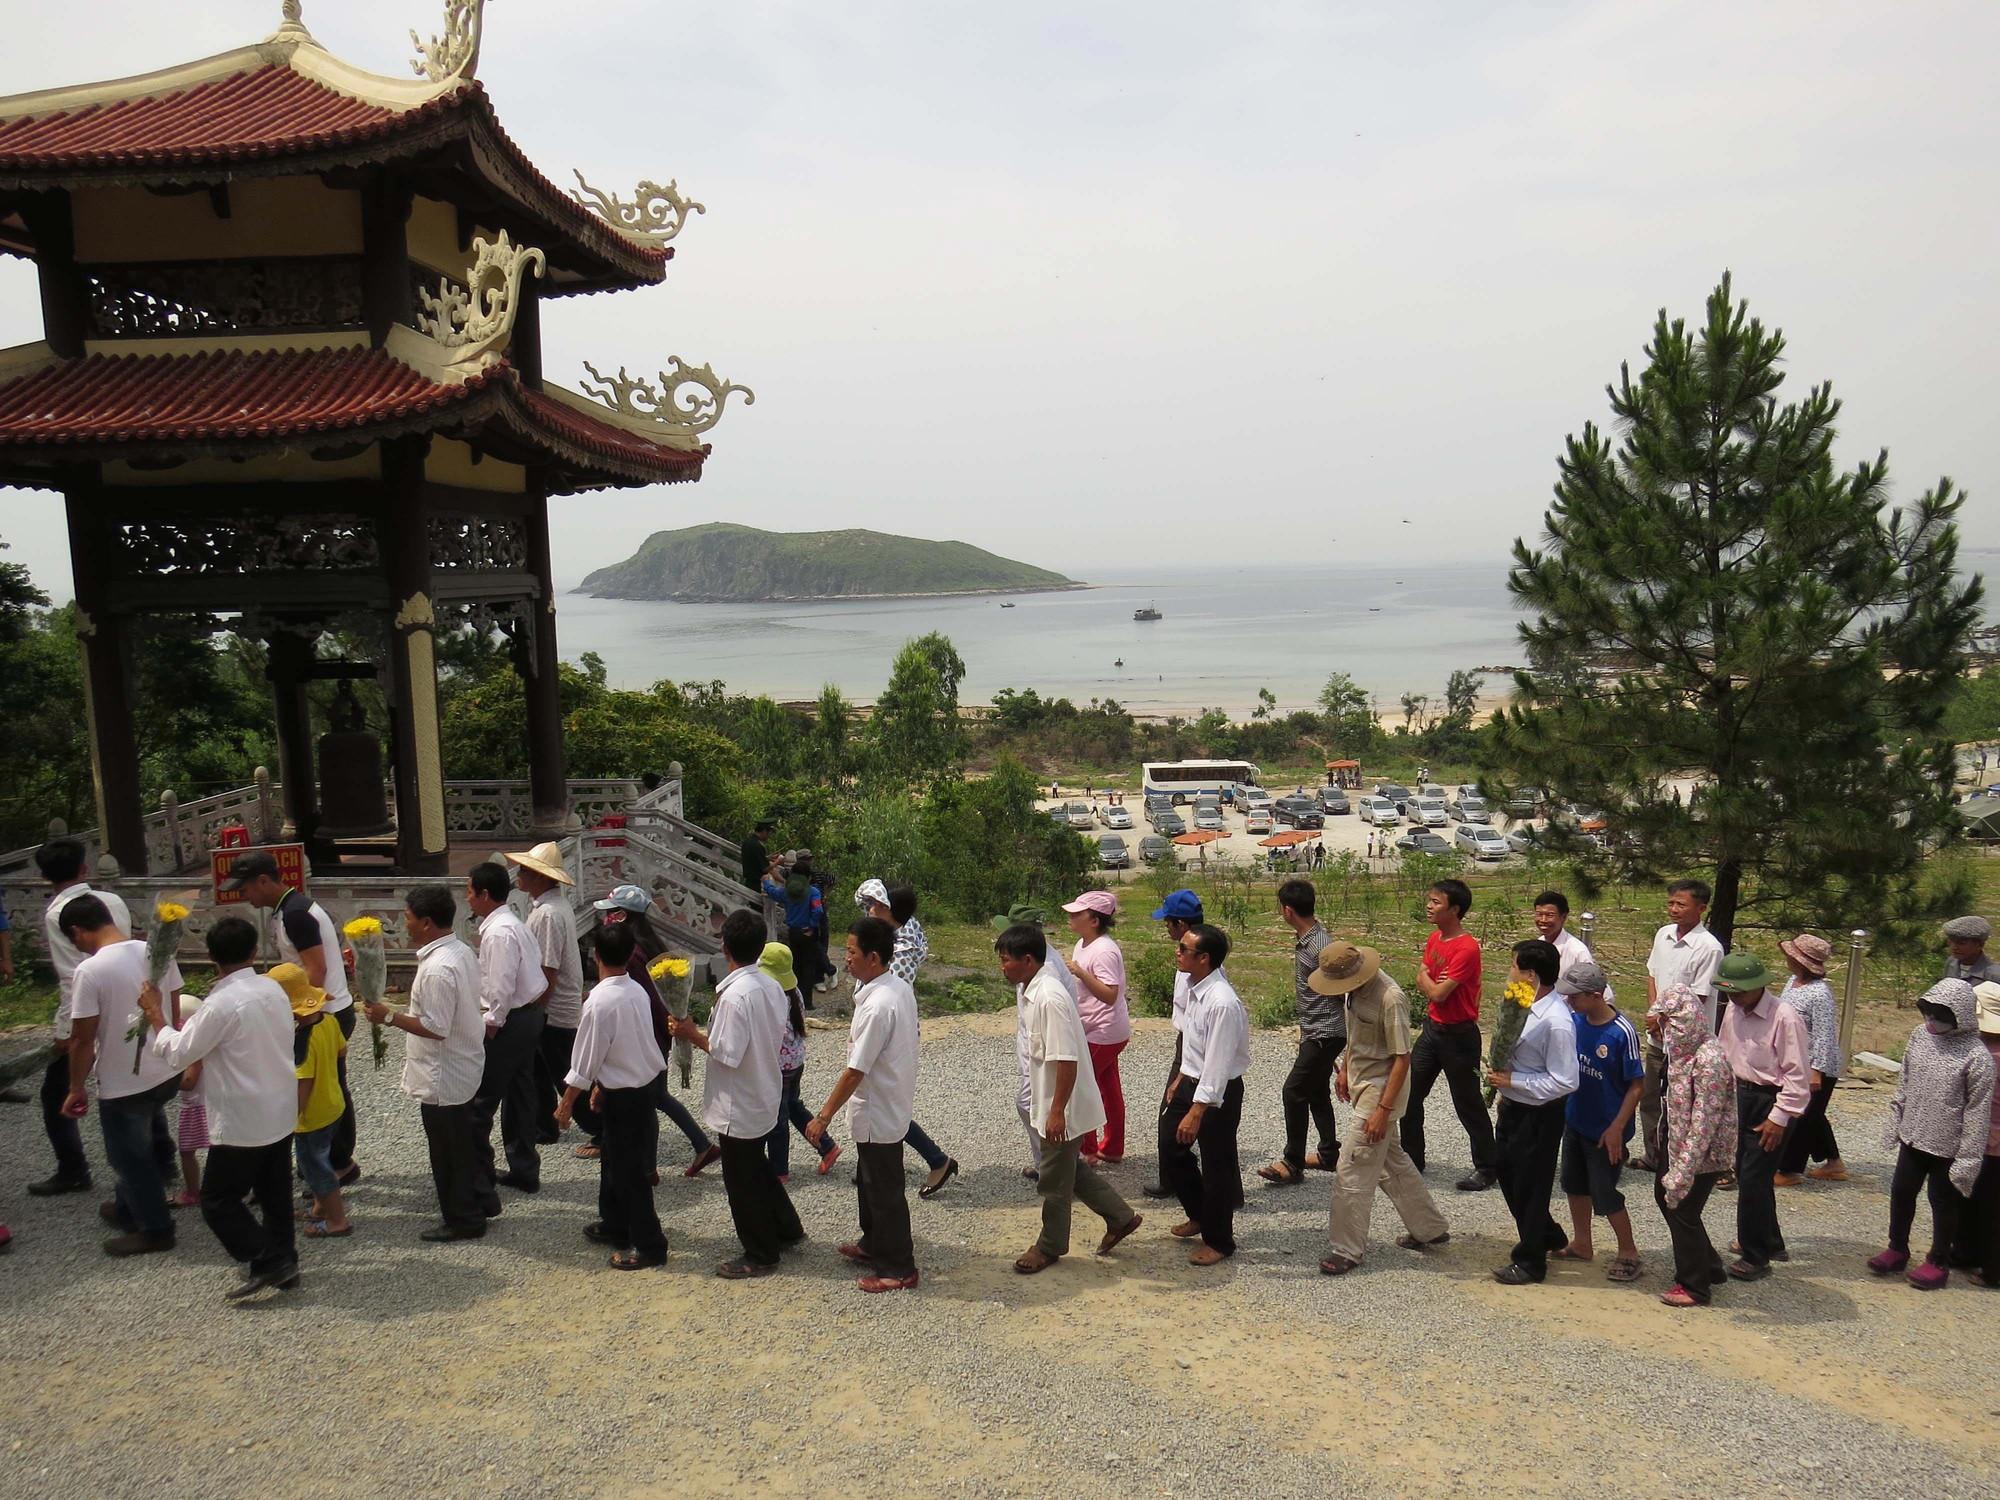 Pilgrims at General Giáp's tomb, Central Vietnam